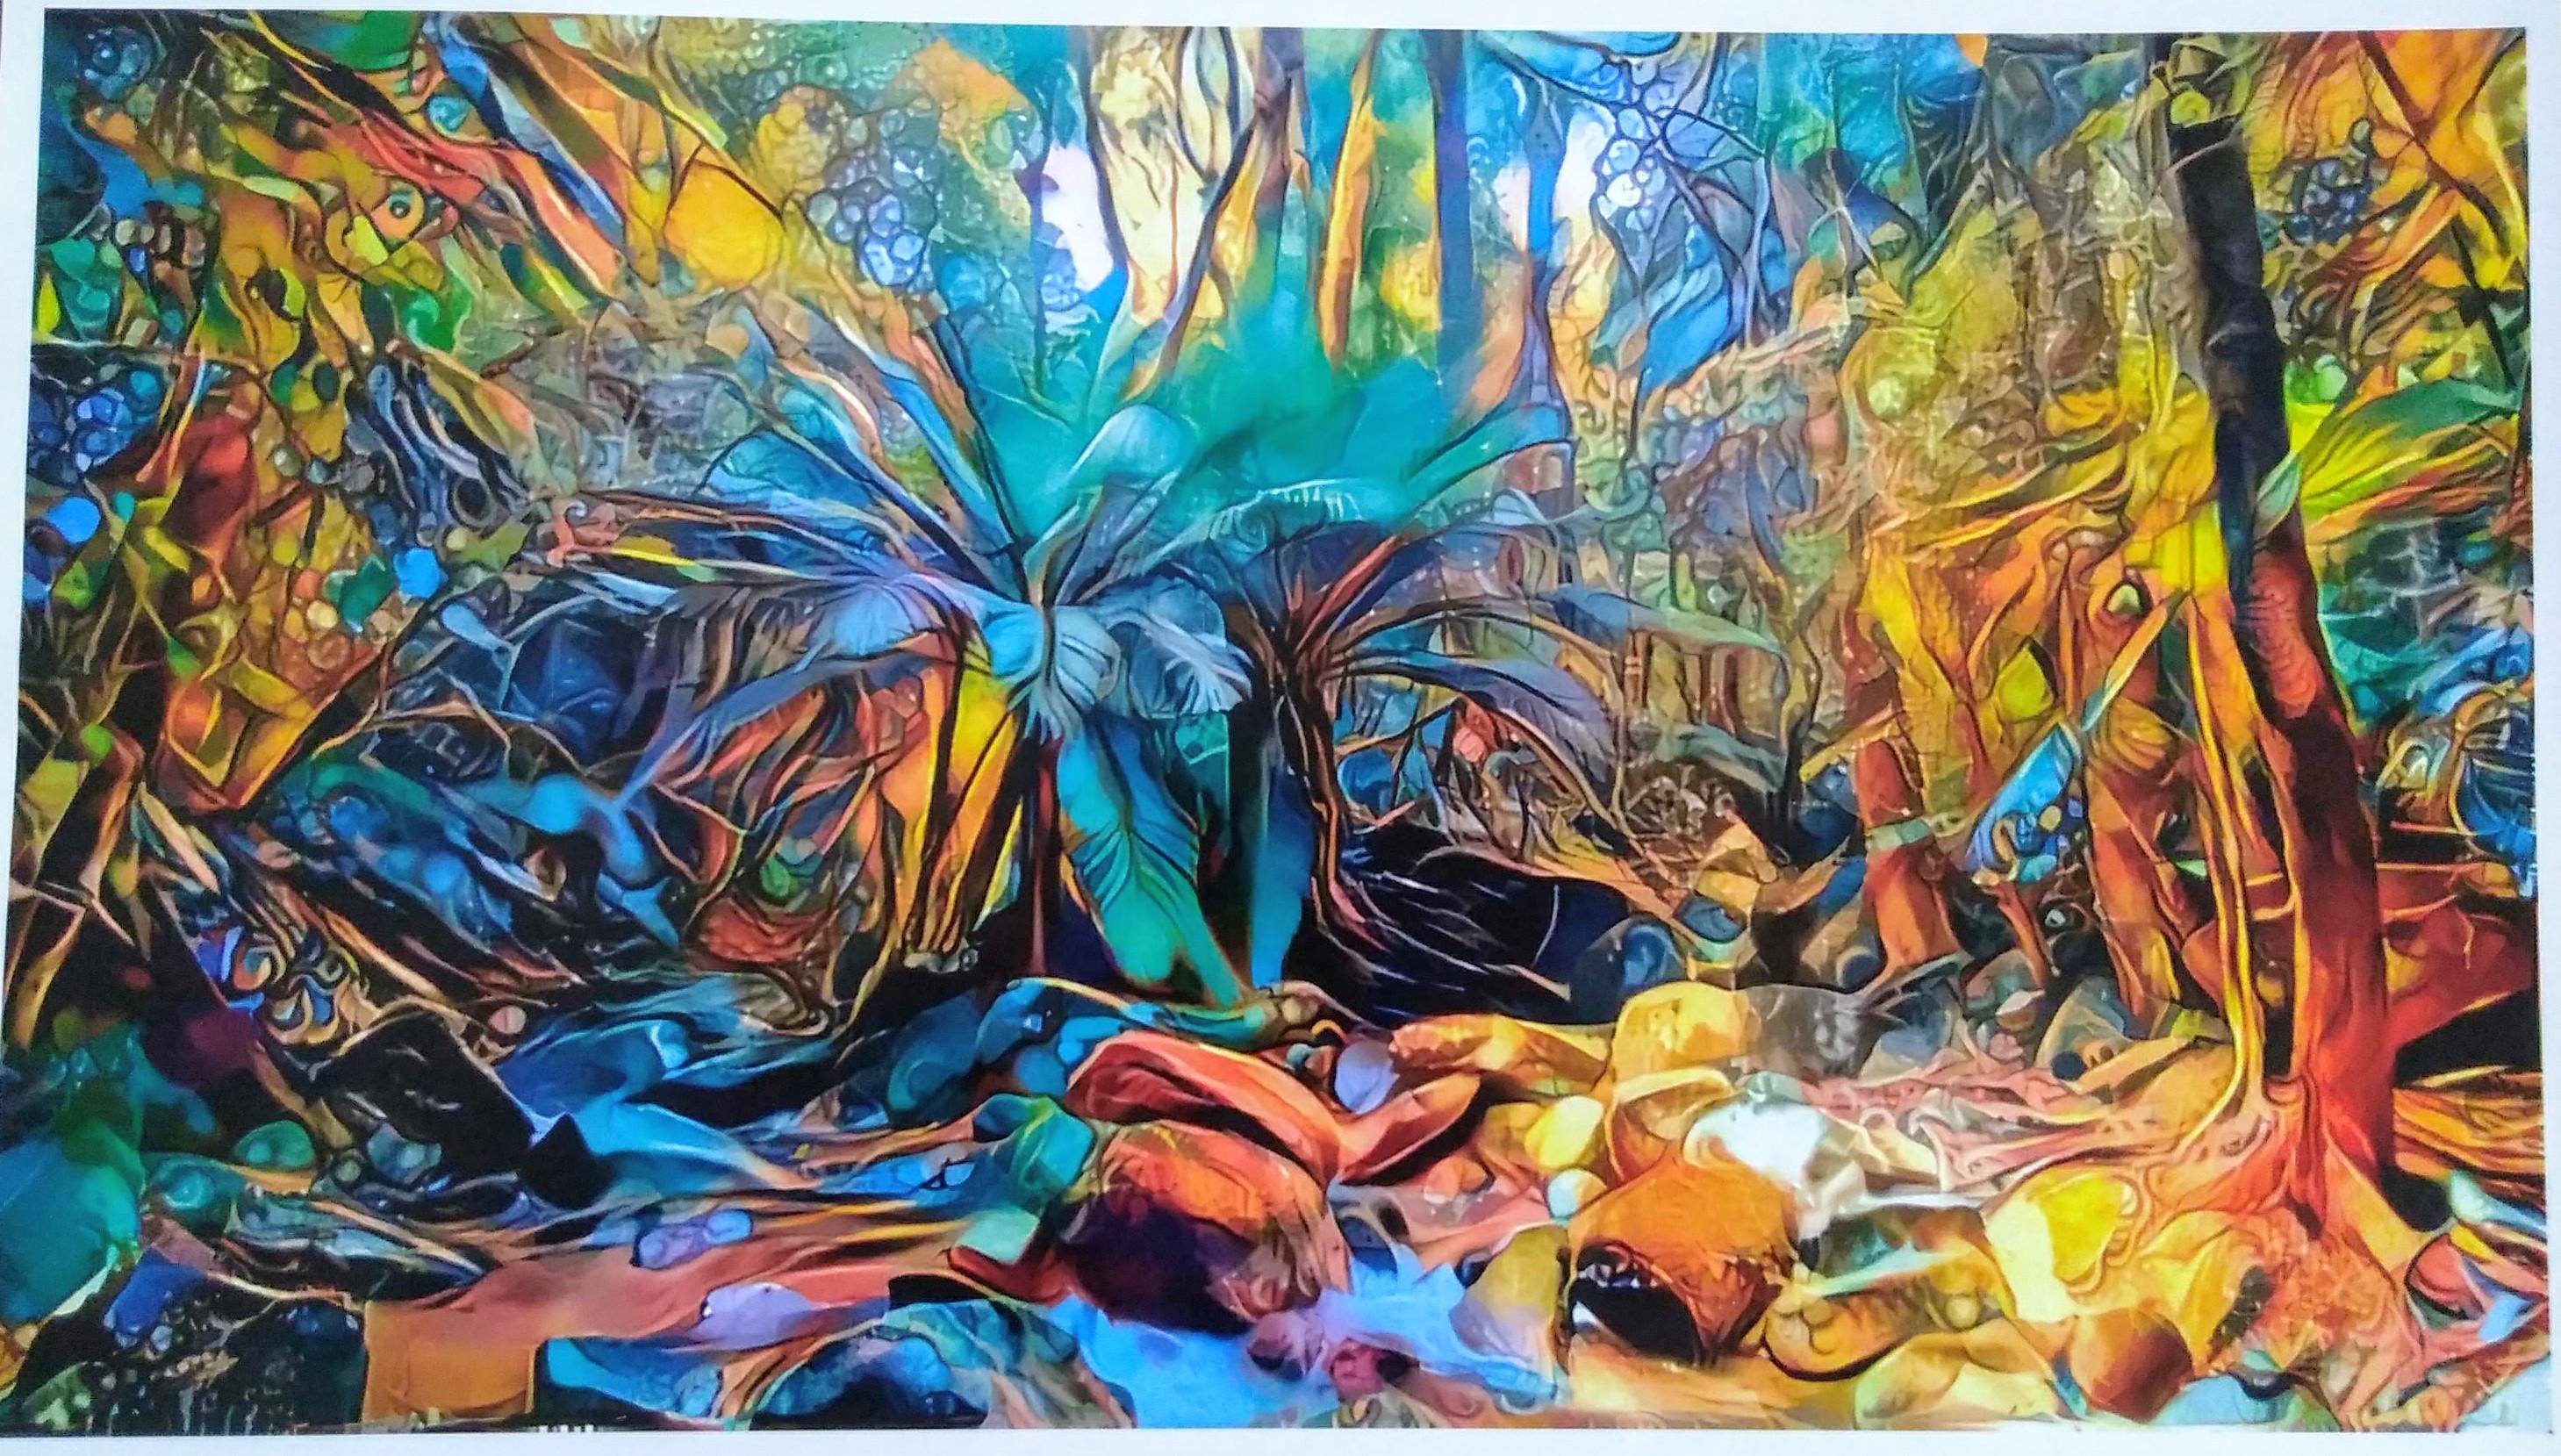 23_Marc_Roth_Rainforest_Dreaming.jpg